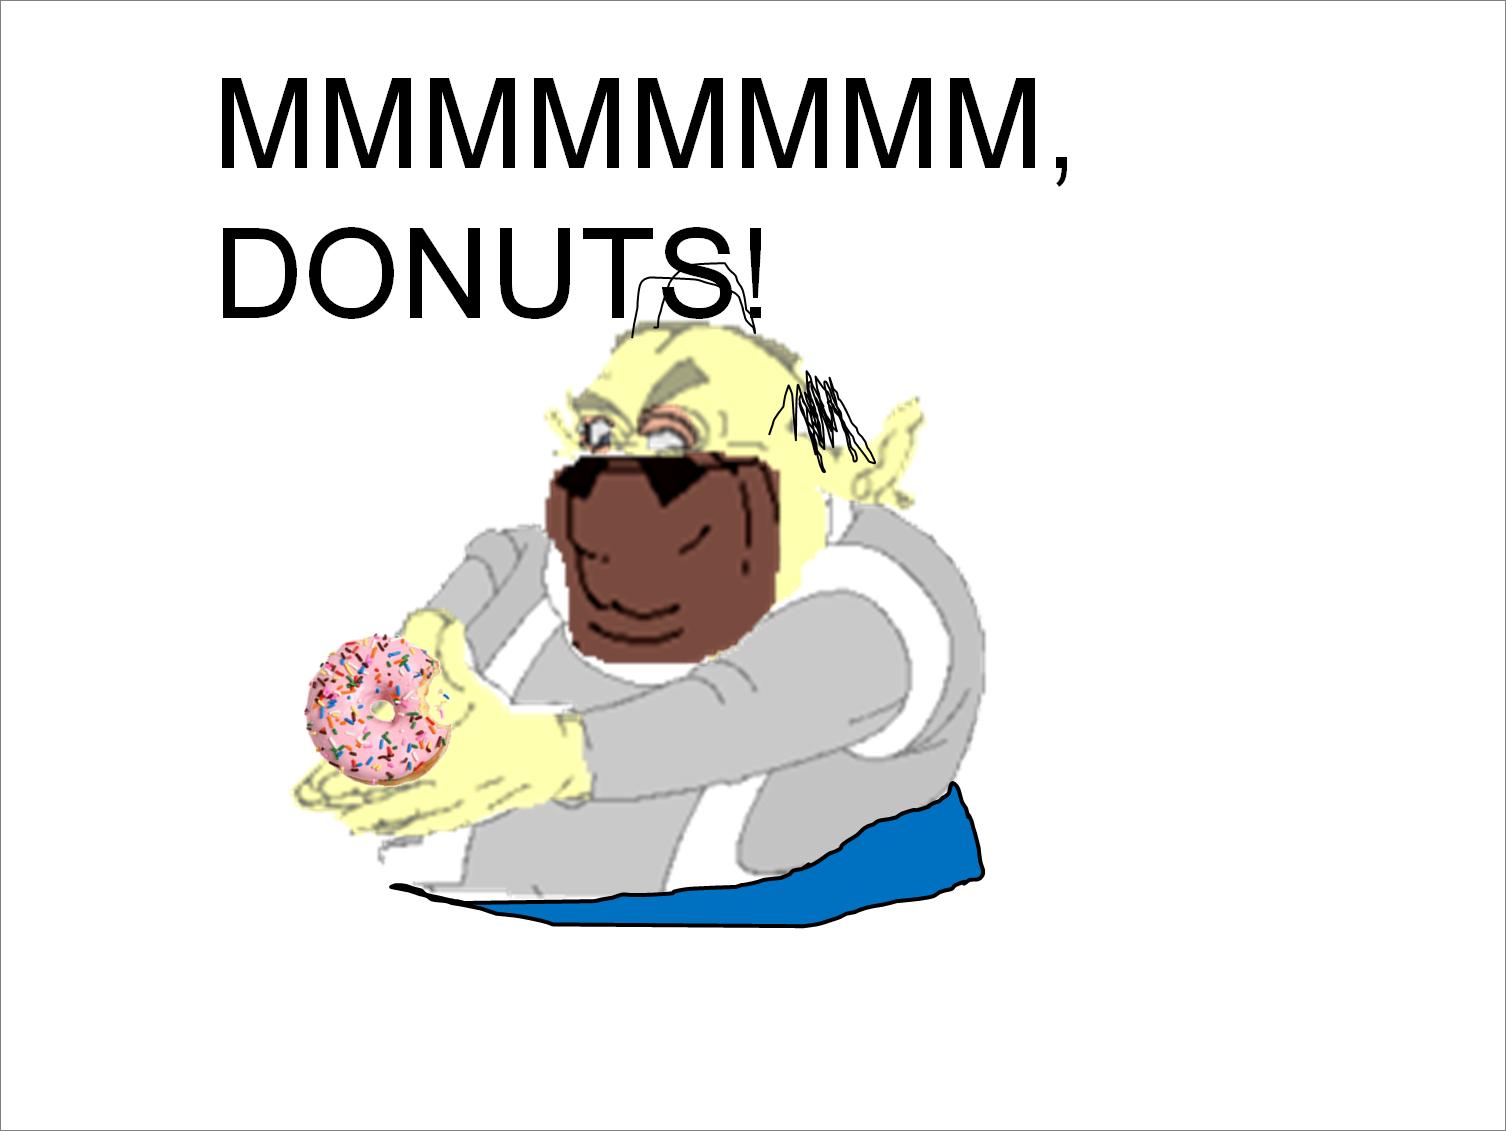 Morshu Homer Jay Simpson Morshus Mmmmmmm Know Your Meme